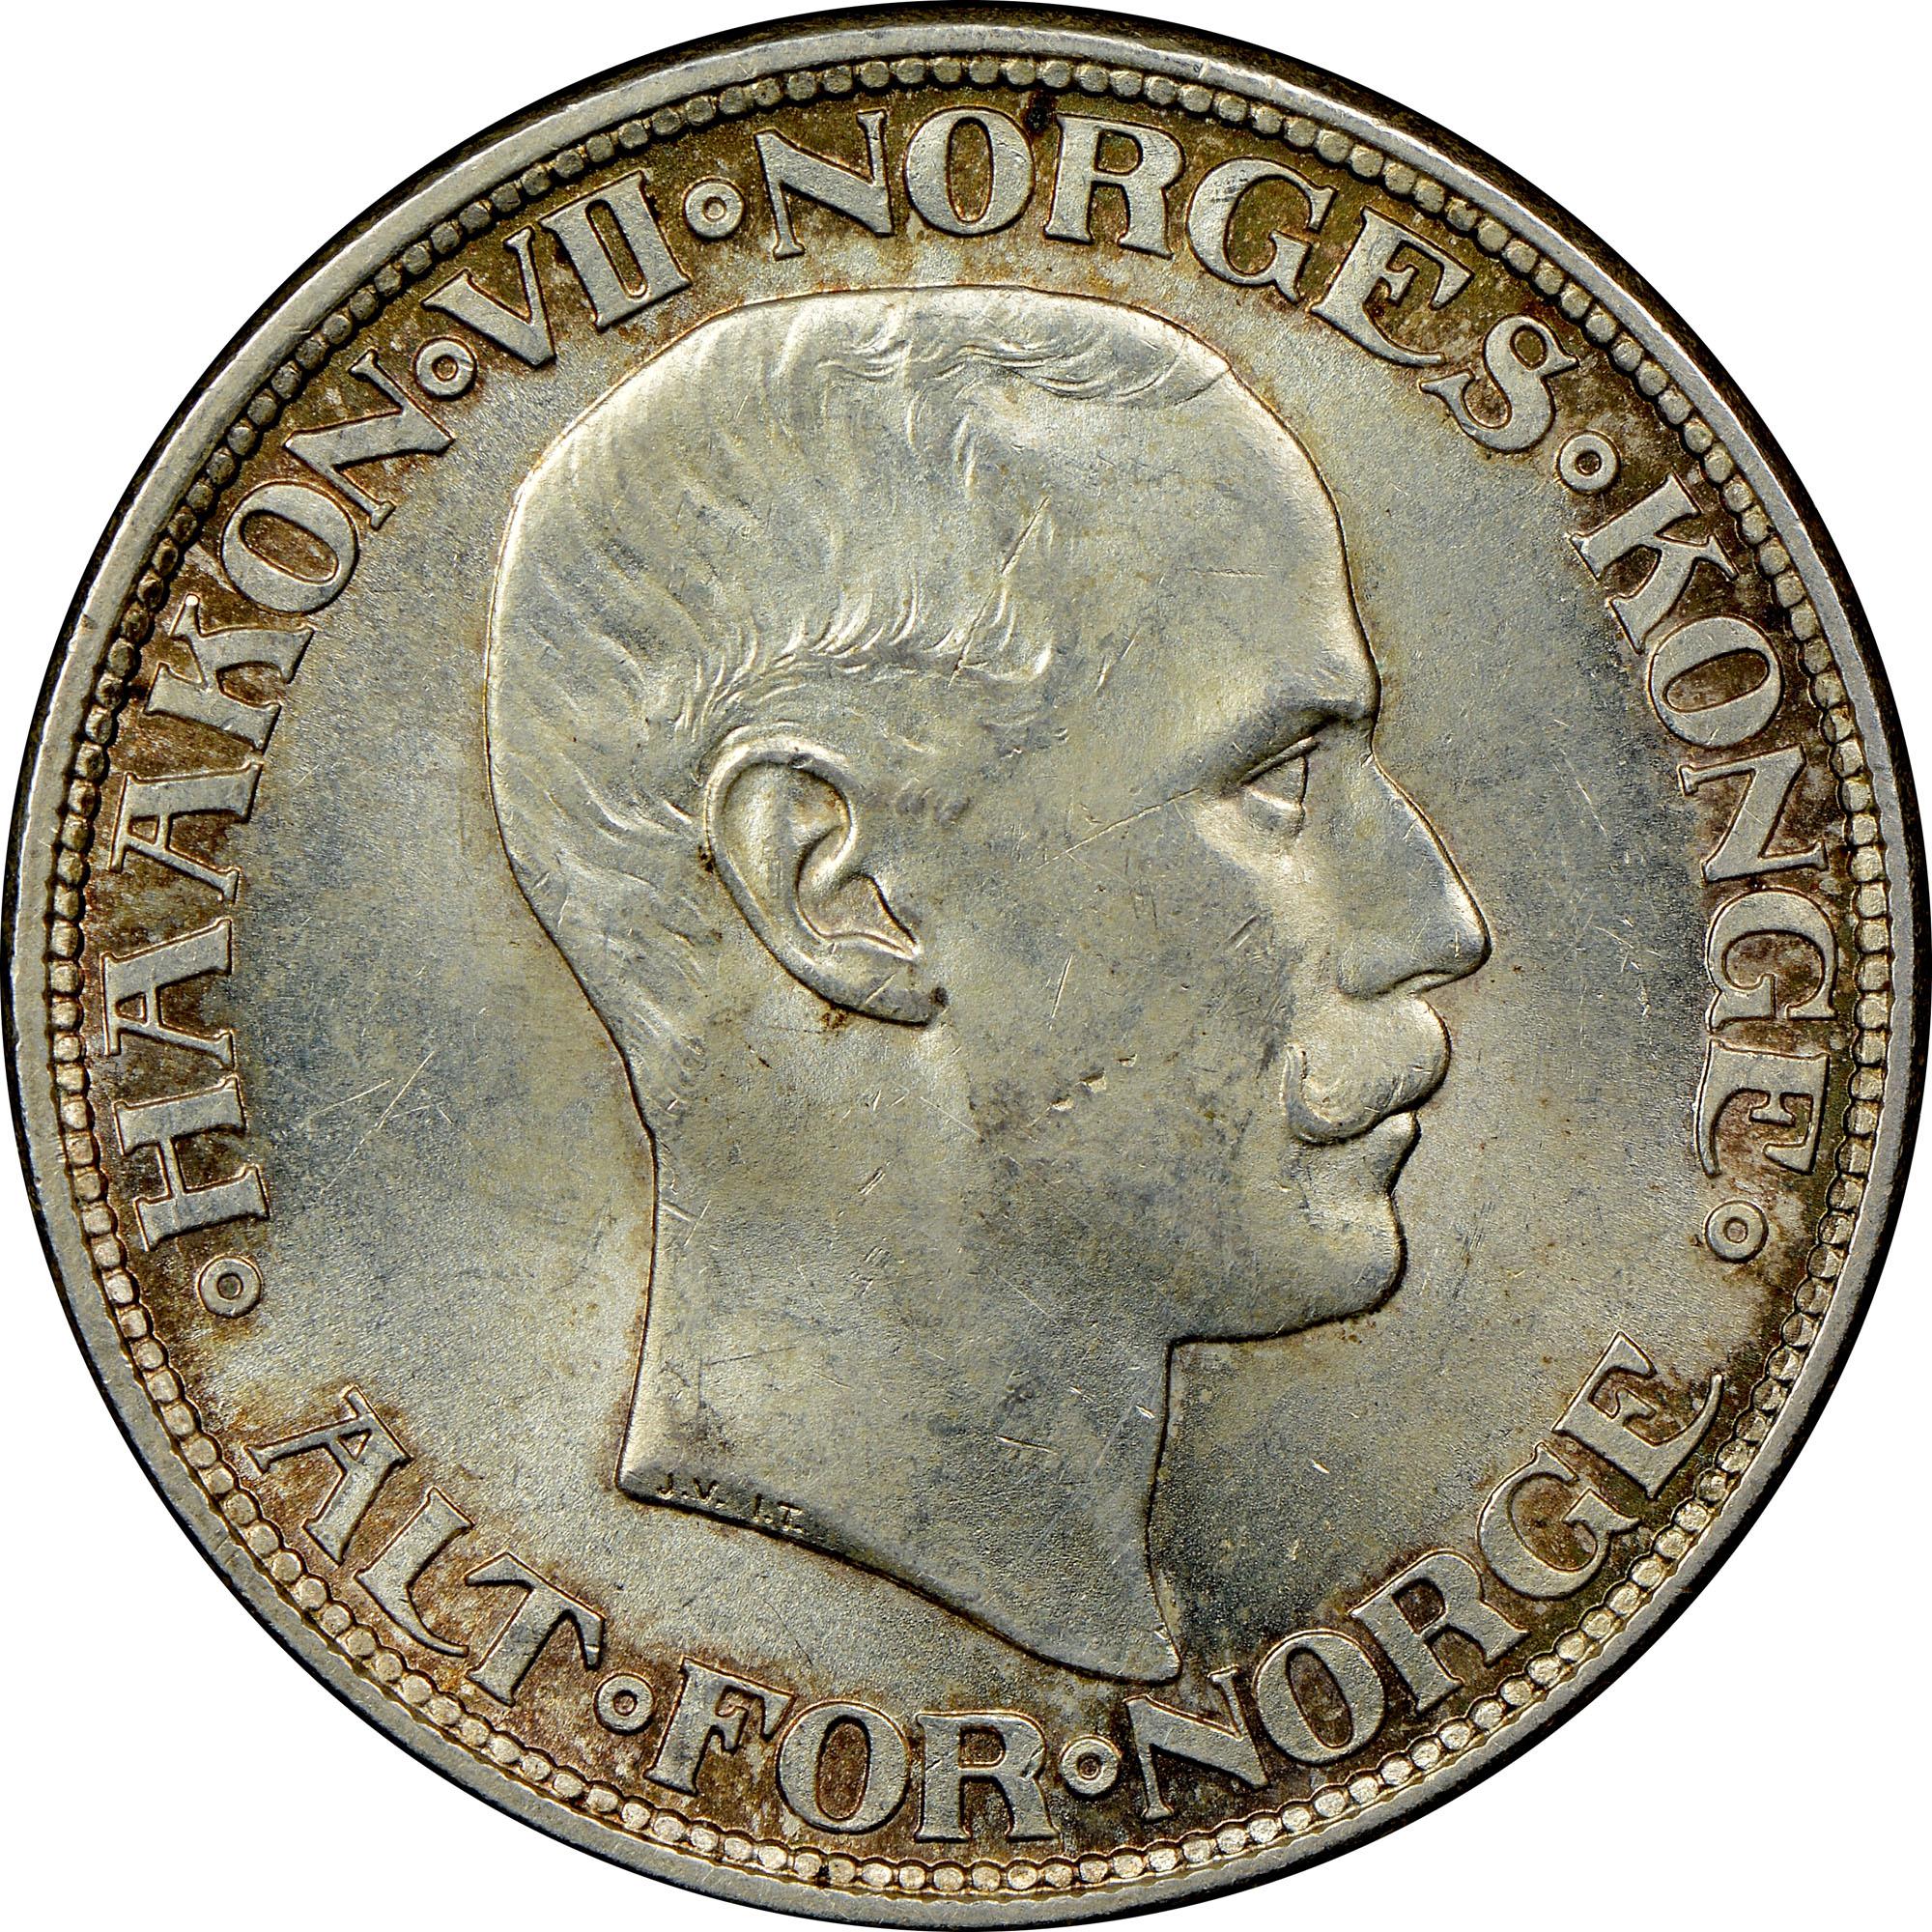 Norway 2 Kroner obverse